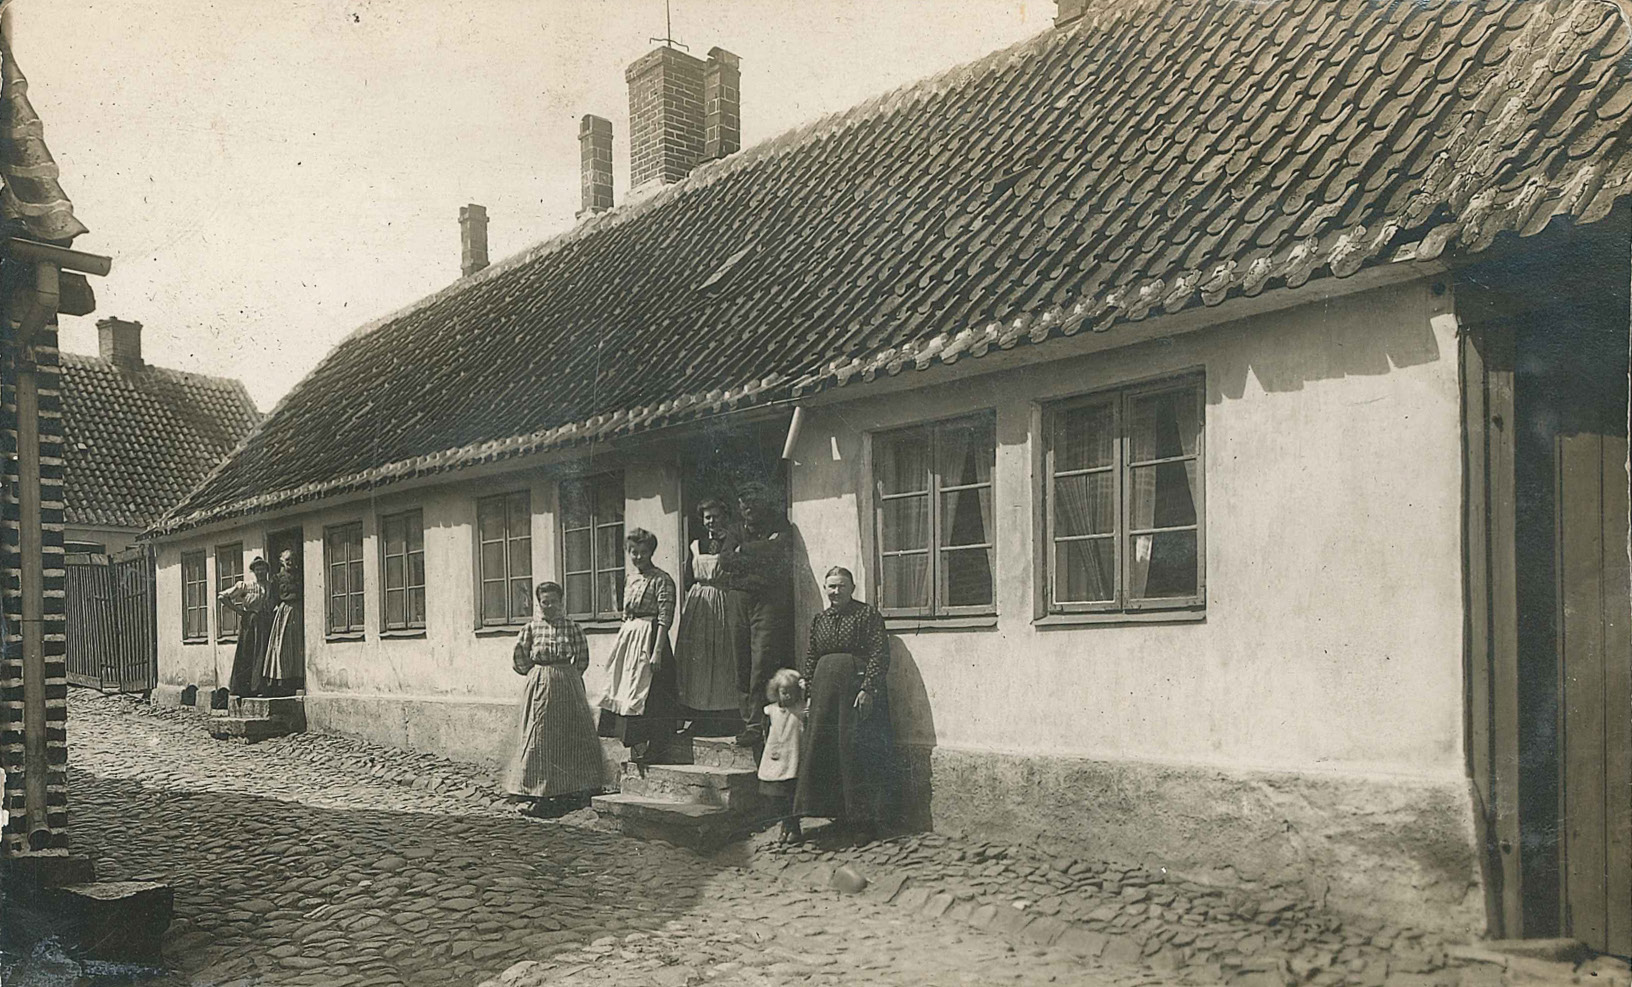 Capt Johan Nilsson's house in Simrishman's near the docks